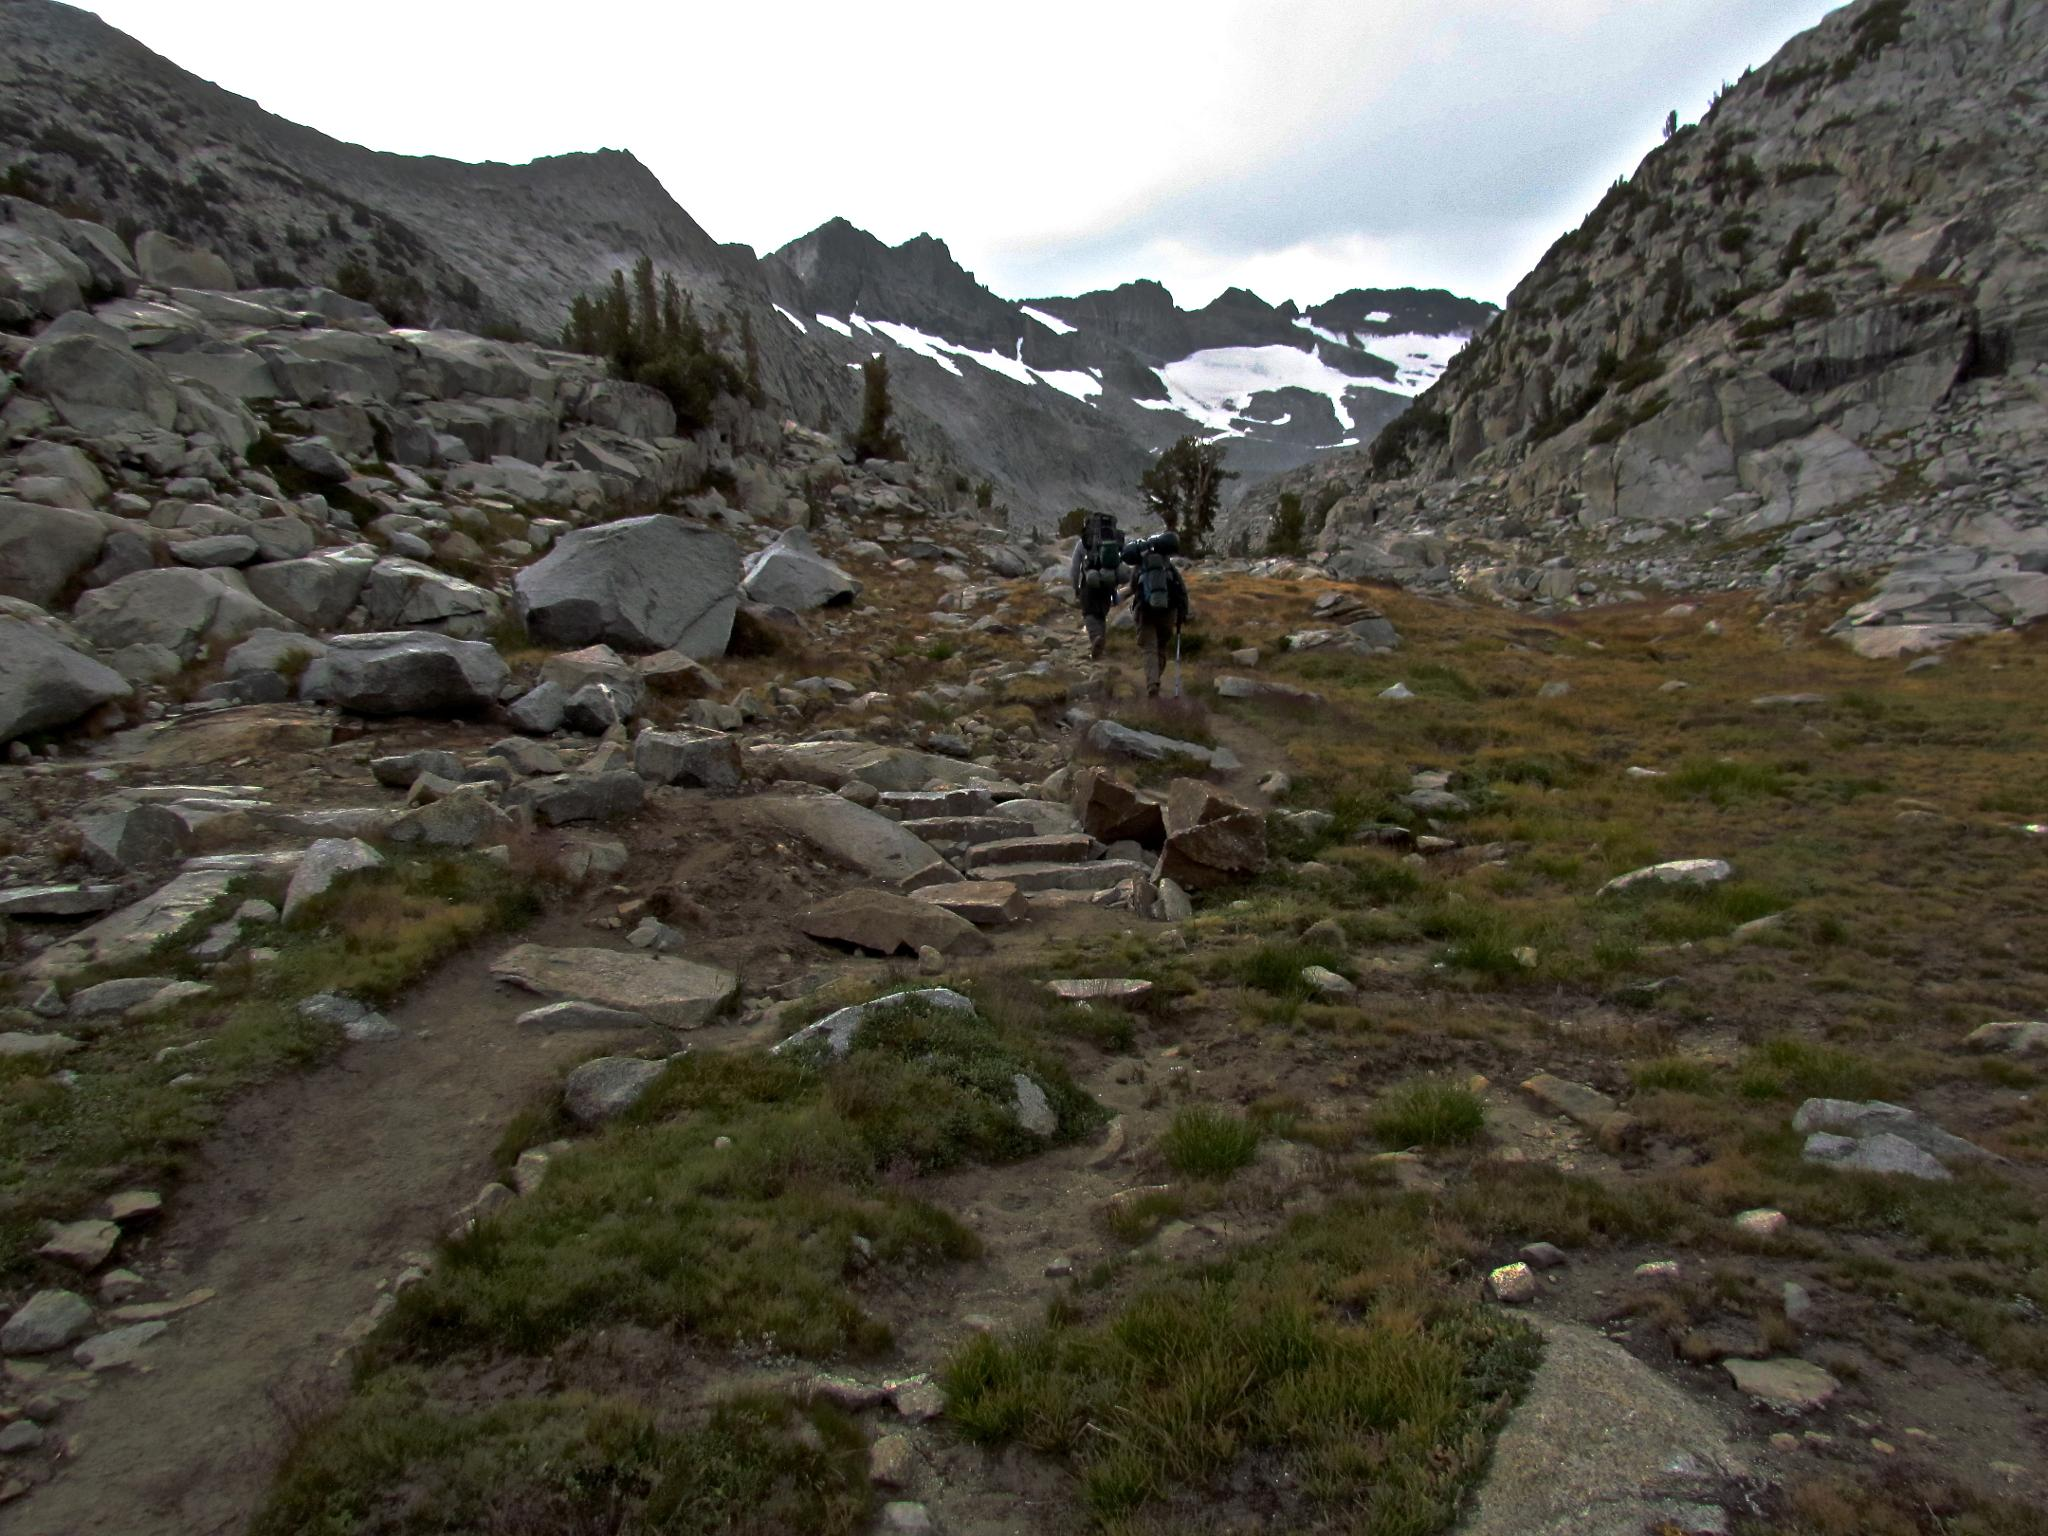 Closing in on Lyell Glacier by MelanieAnnePhillips